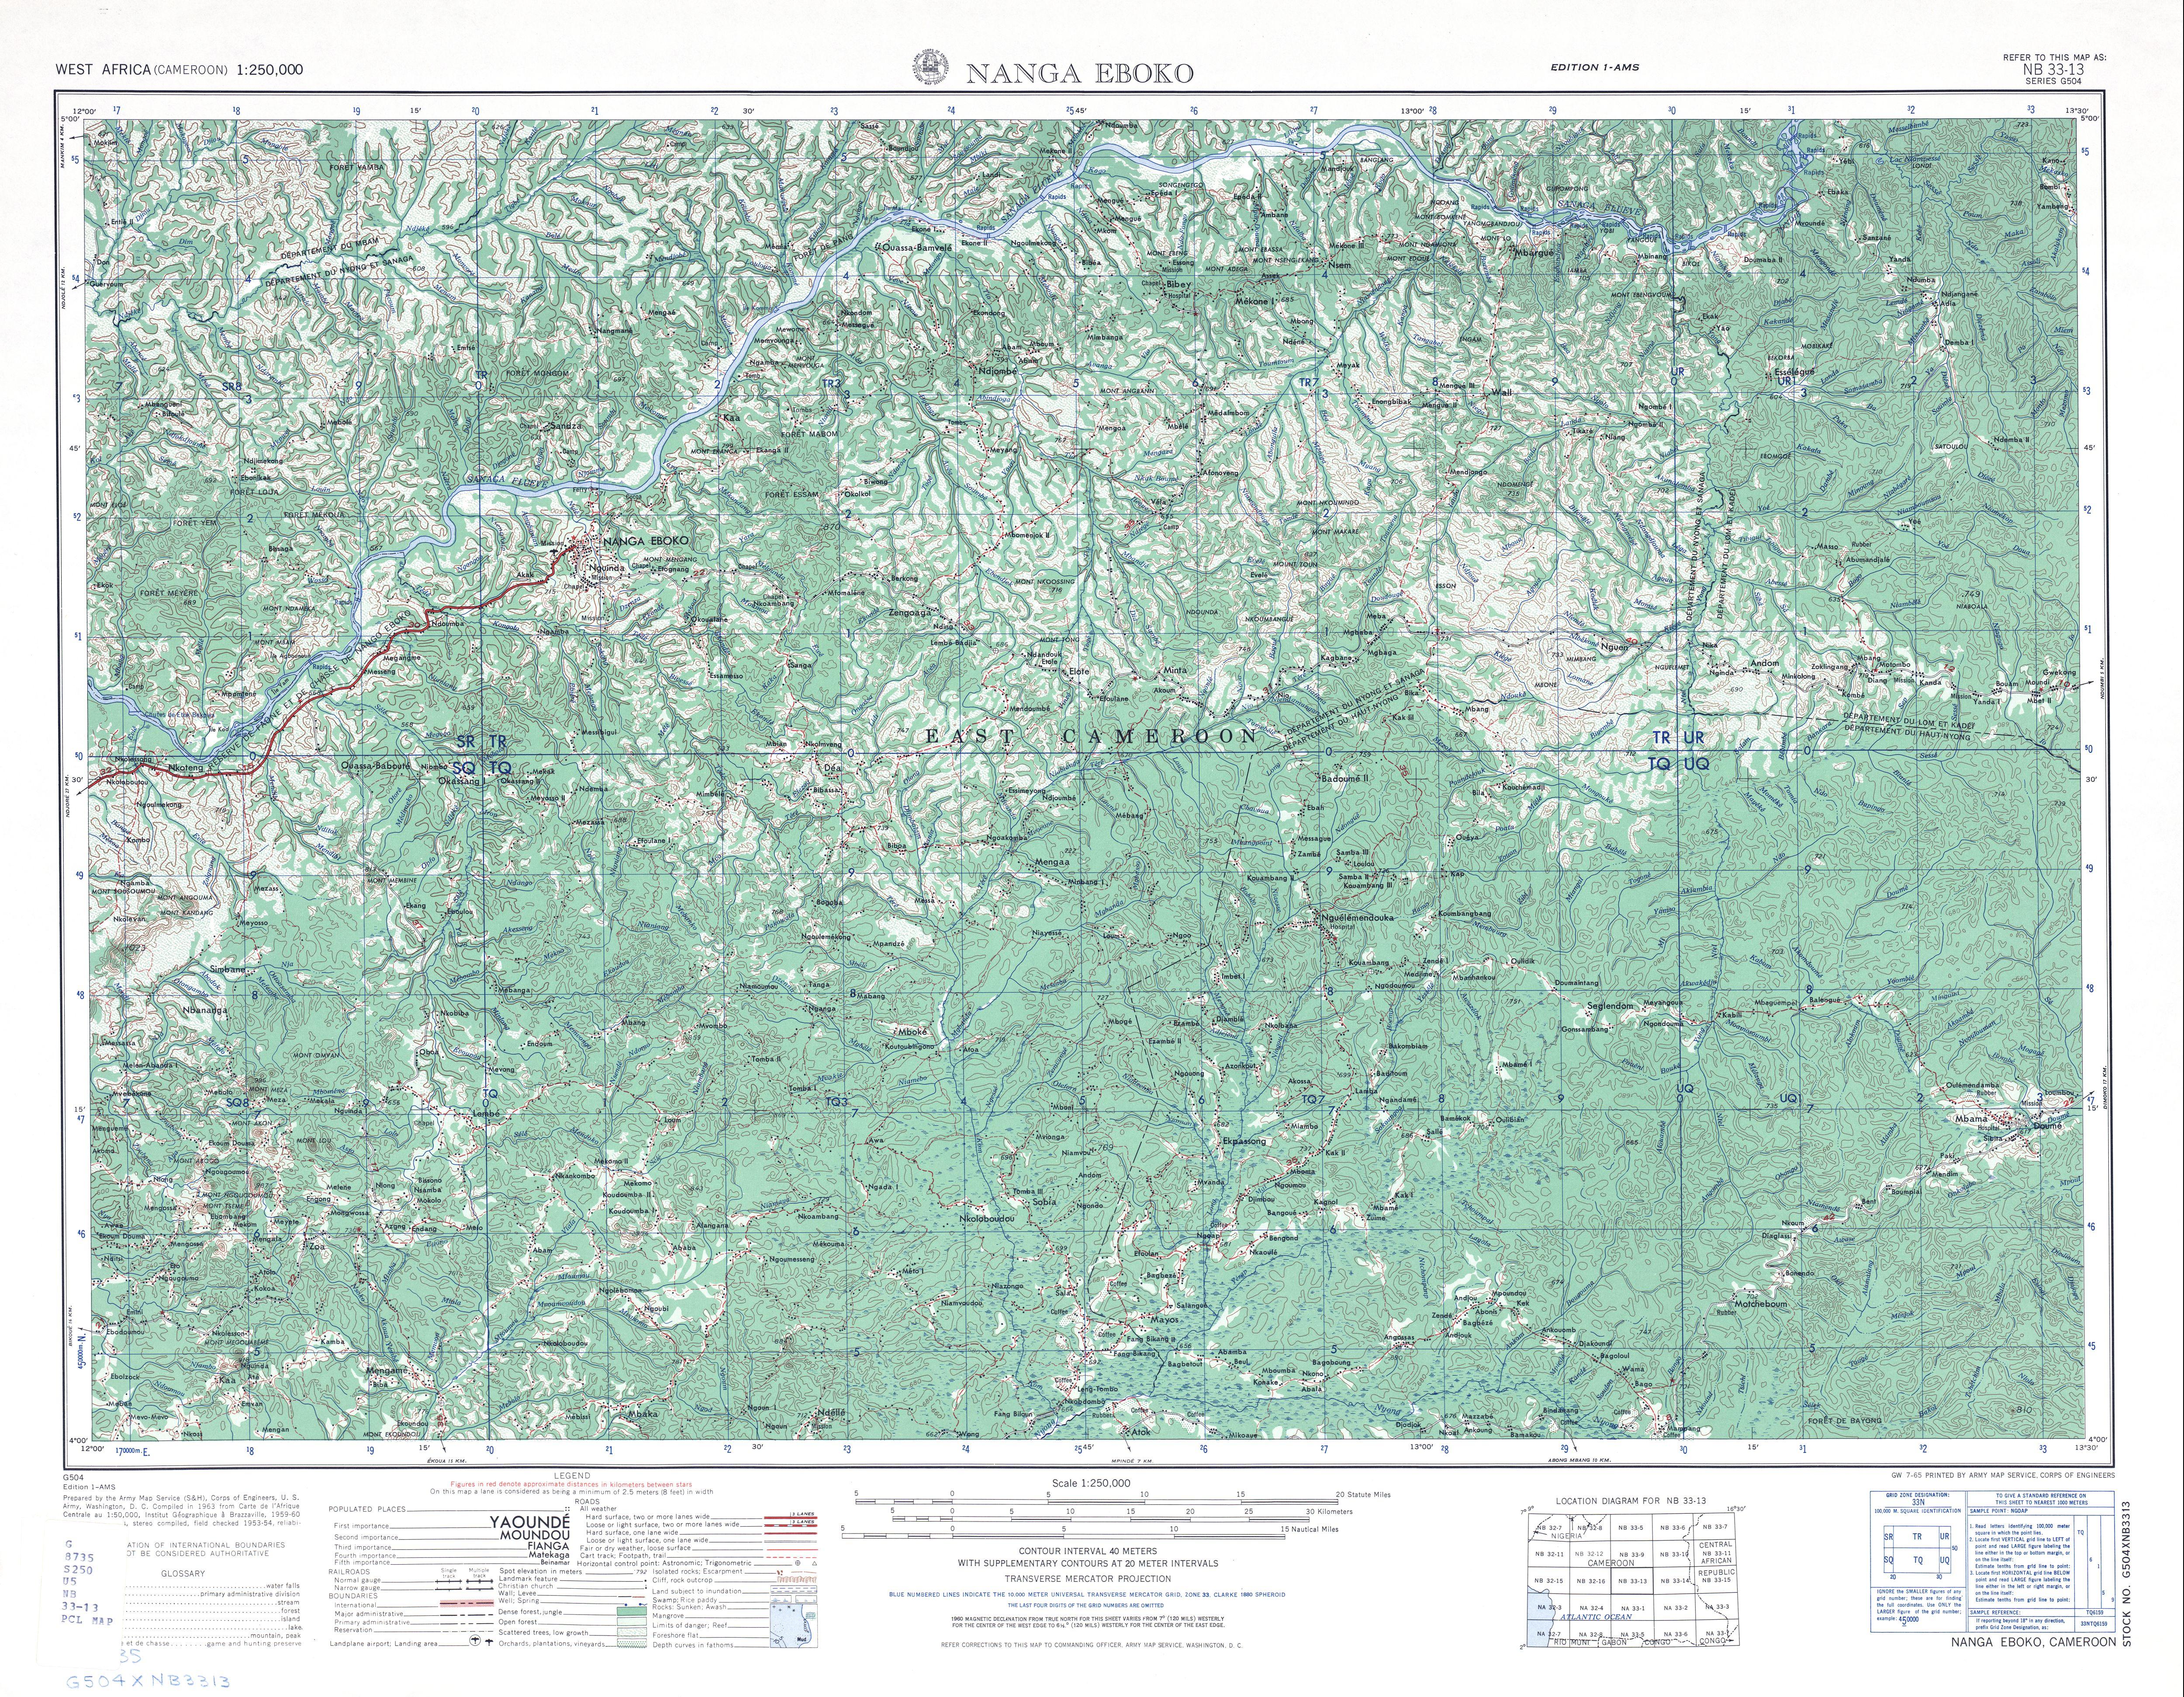 Hoja Nanga Eboko del Mapa Topográfico de África Occidental 1955